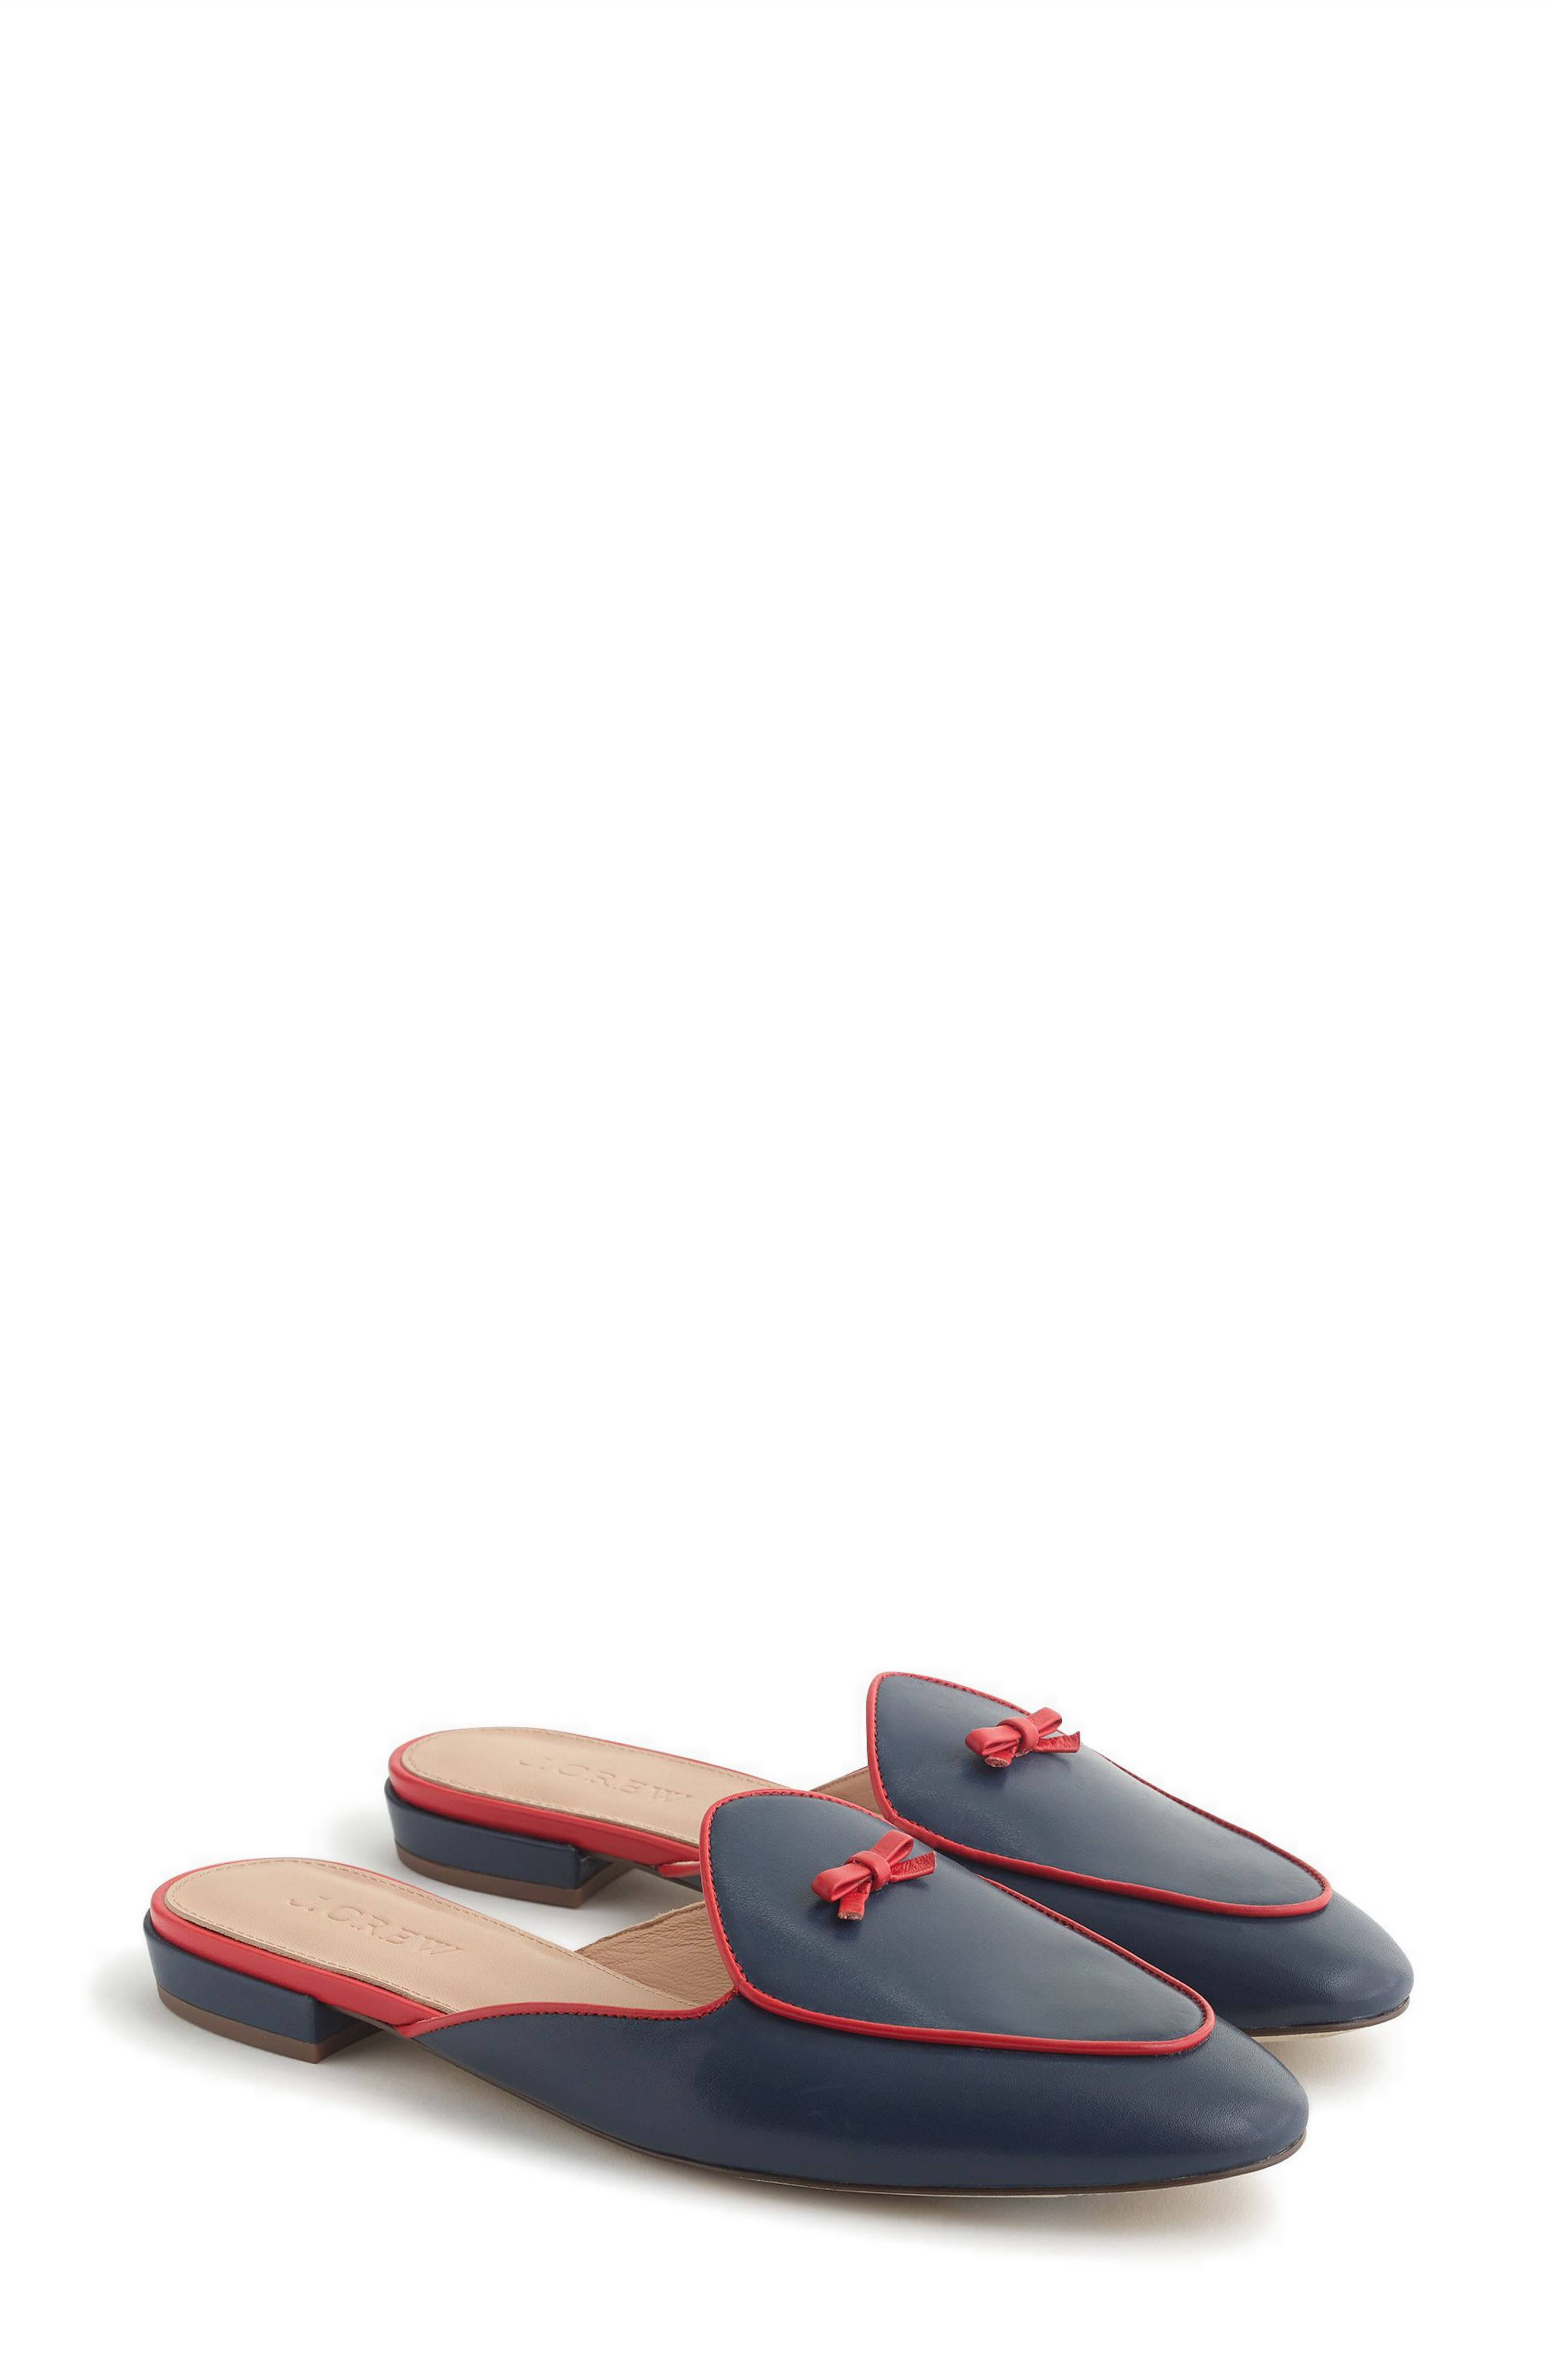 Loafer Mule,                         Main,                         color, Bright Indigo Leather